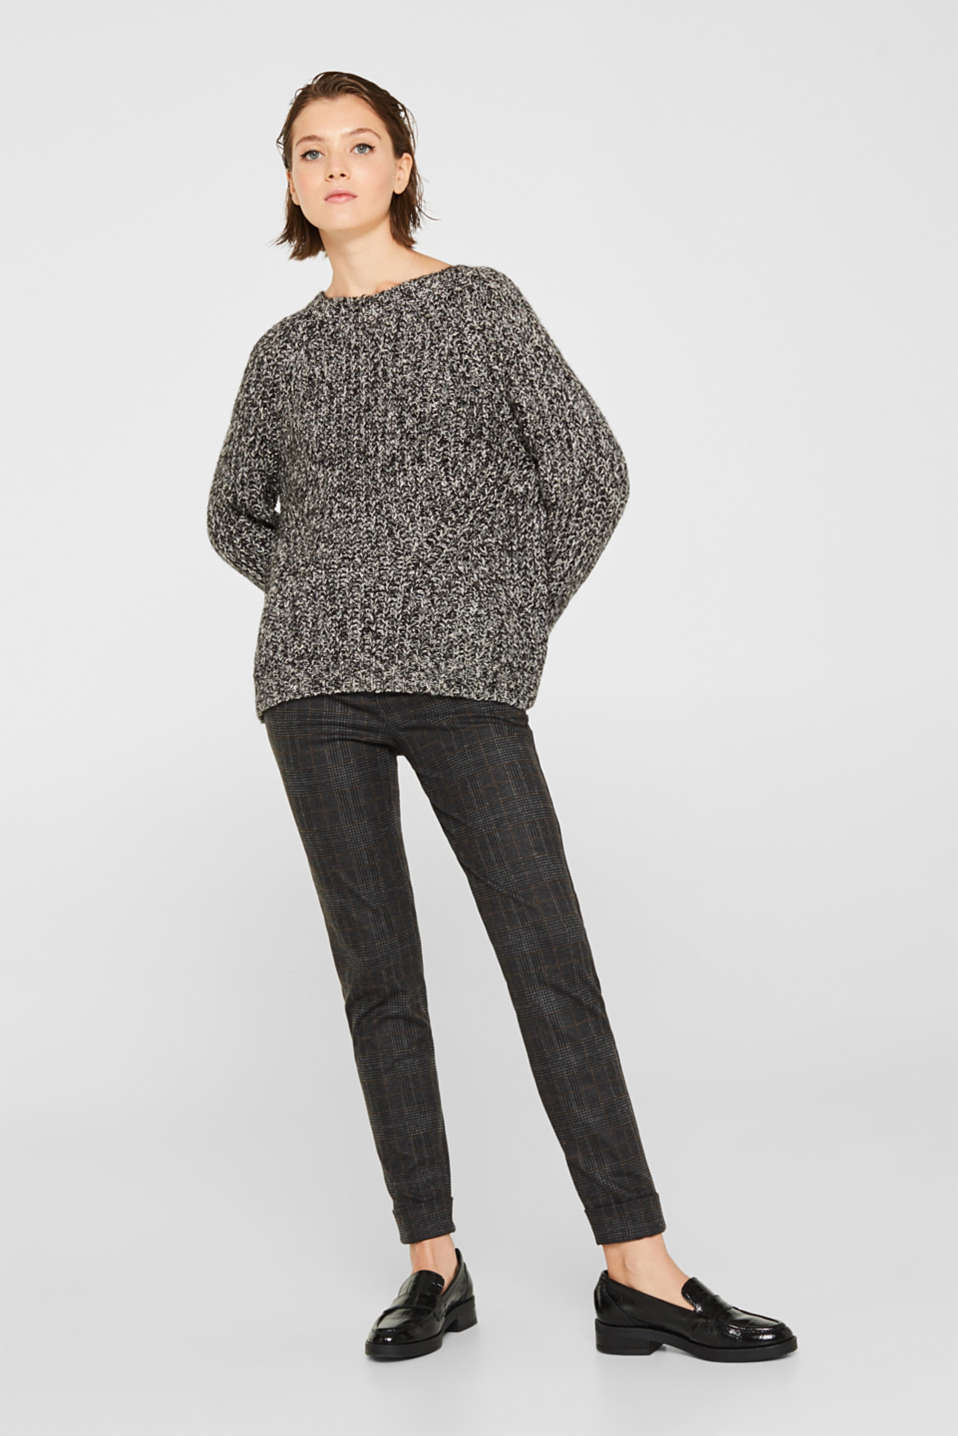 With wool: mouliné jumper, GUNMETAL 4, detail image number 5